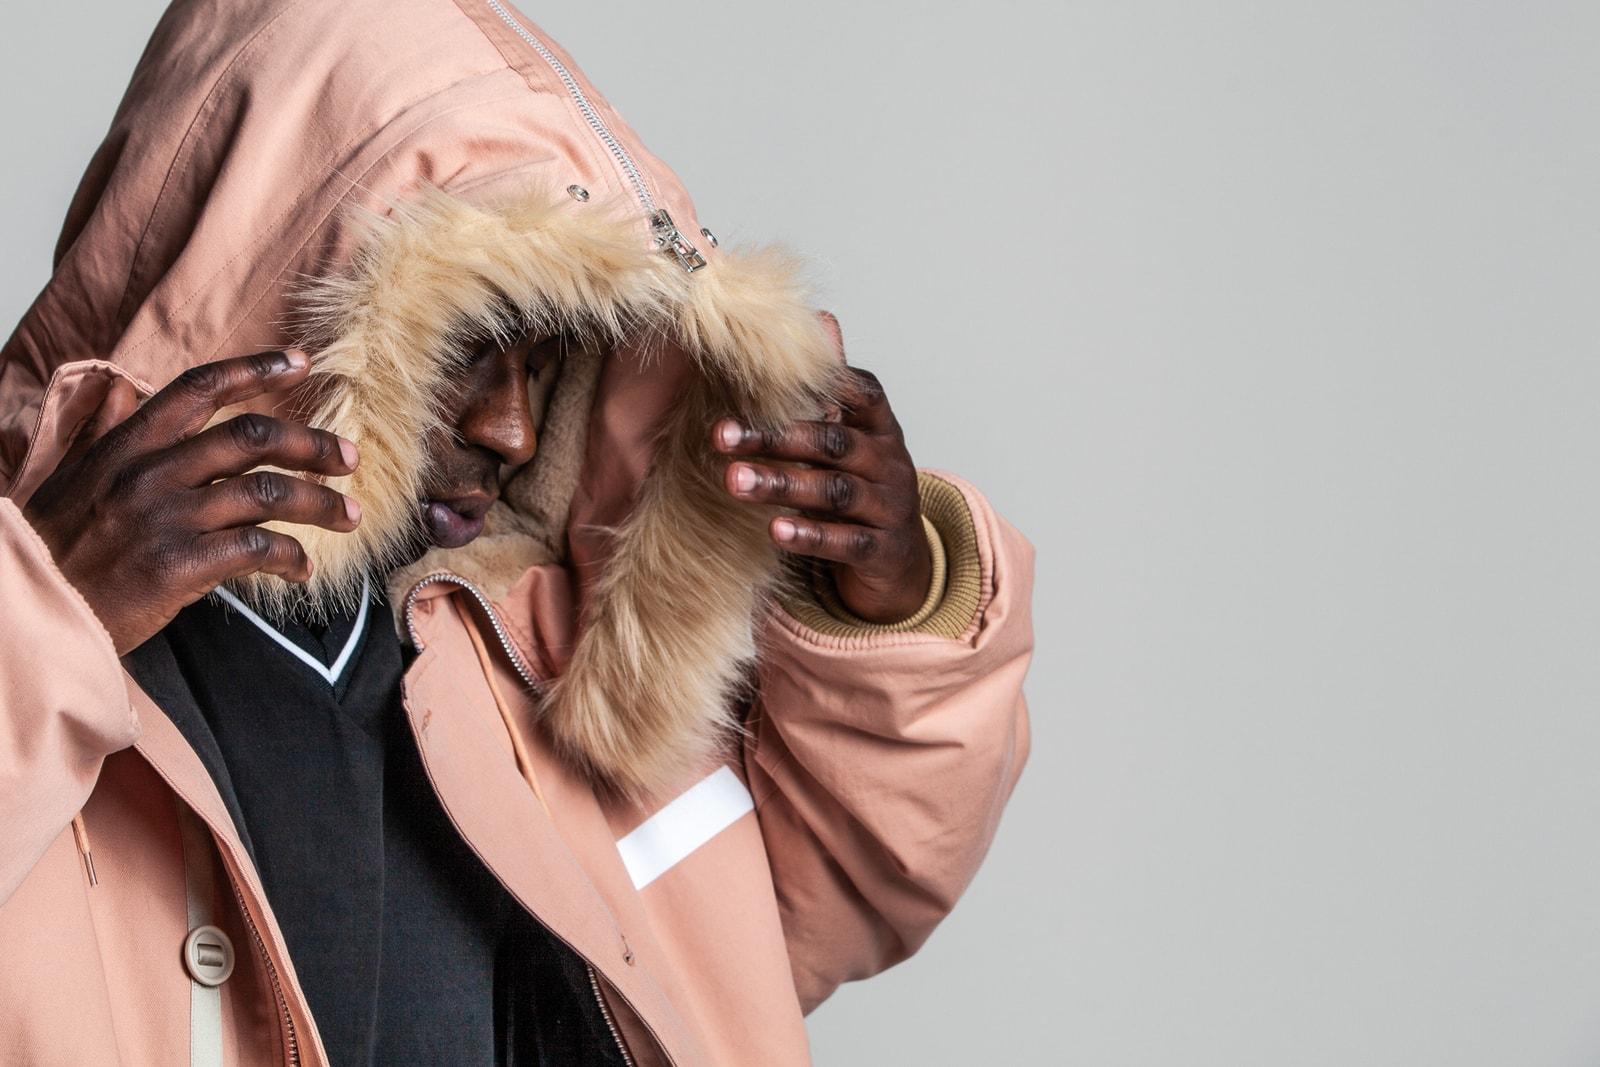 Supreme Spring/Summer 2018 Drop 21 Release Info